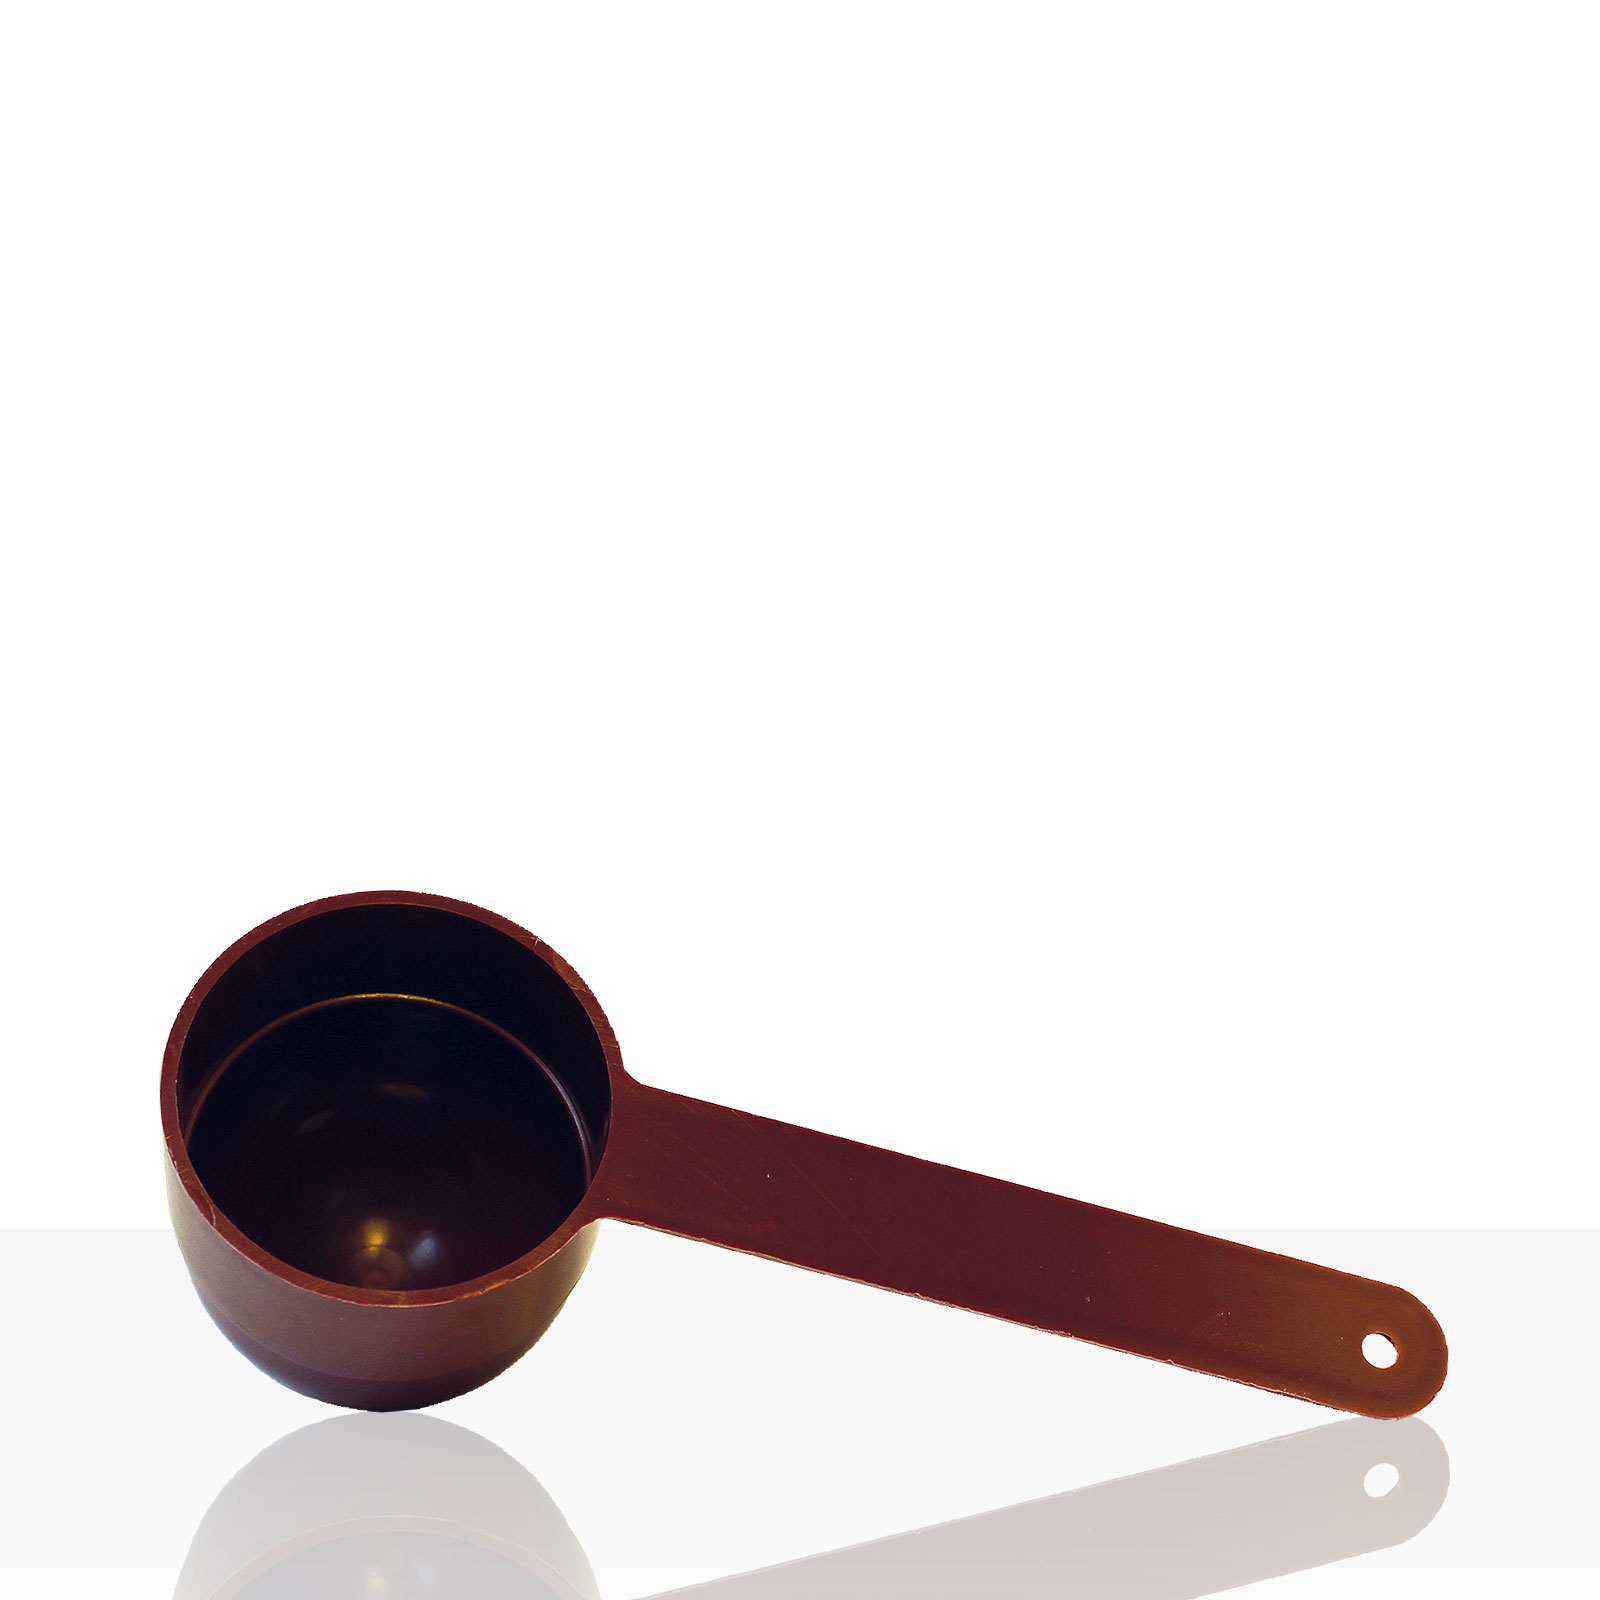 Bonamat Kaffeelot ca. 40 Gramm, Kaffeelöffel für Filterkaffee, Dosierlöffel